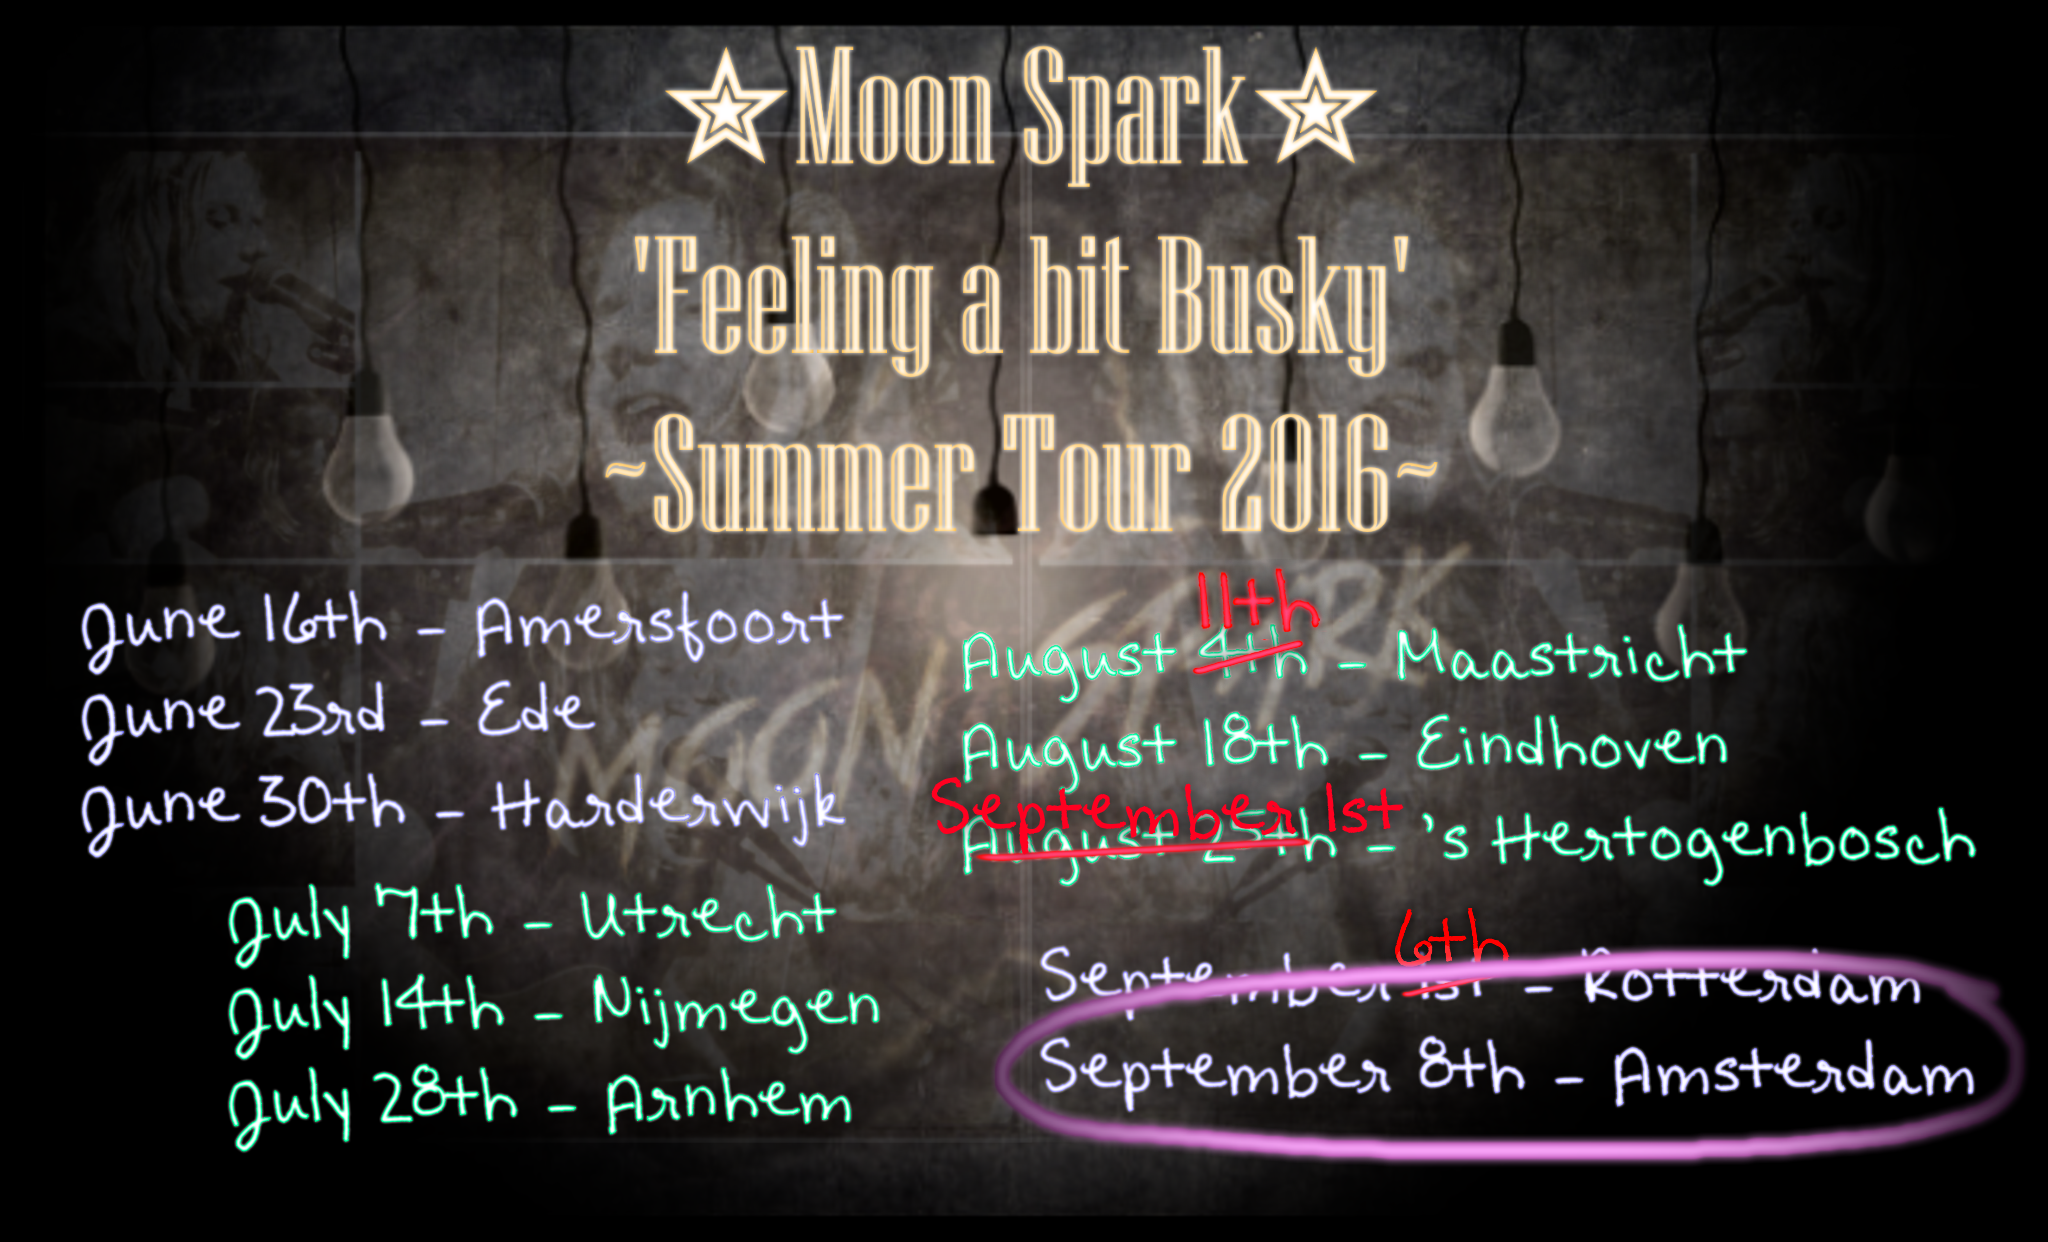 feeling-a-bit-busky-summertour-poster-4-finale-amsterdam